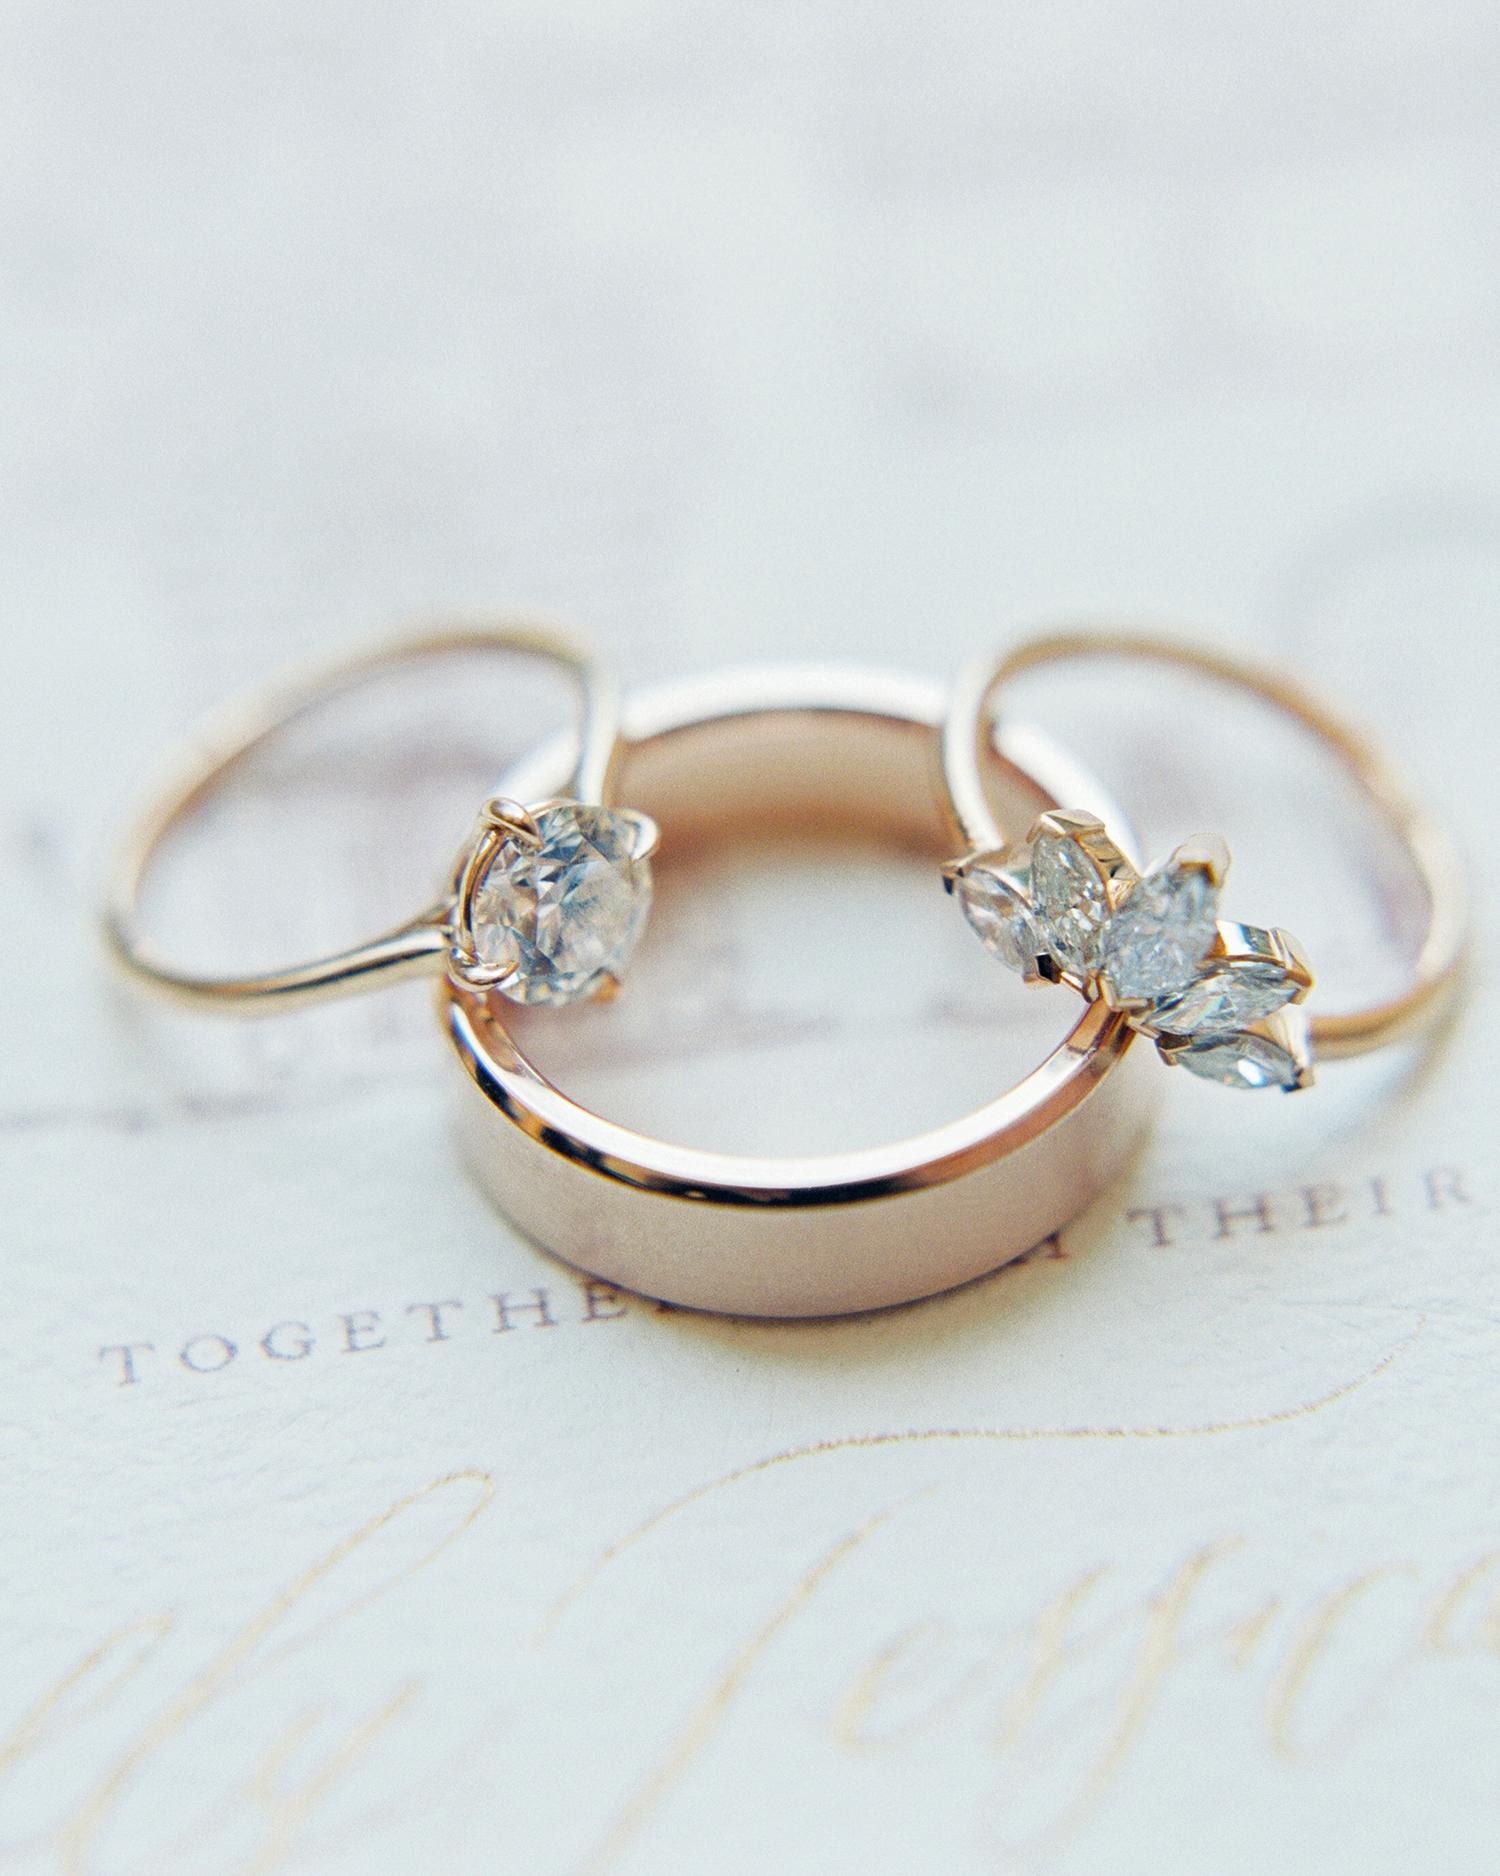 molly josh wedding rings